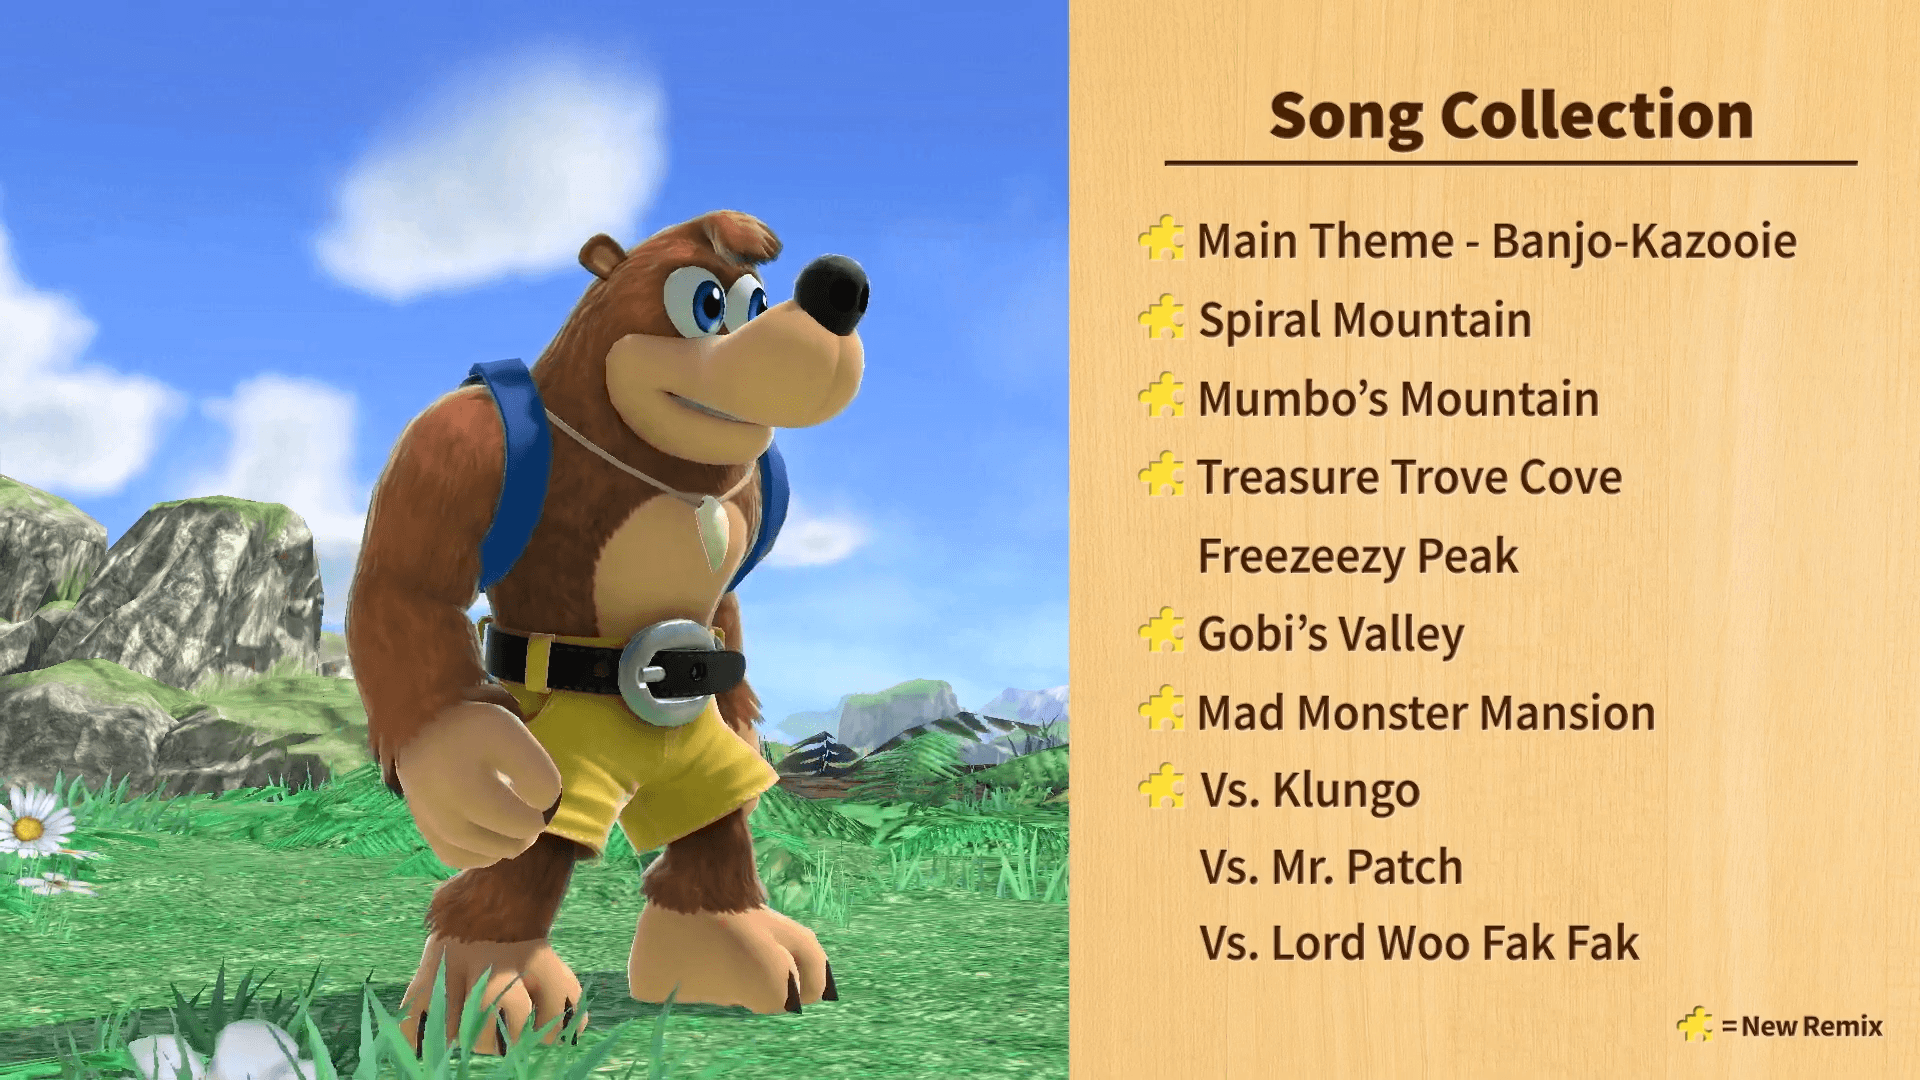 Banjo-Kazooie, Sans, and Home Run Contest Arrive in Smash